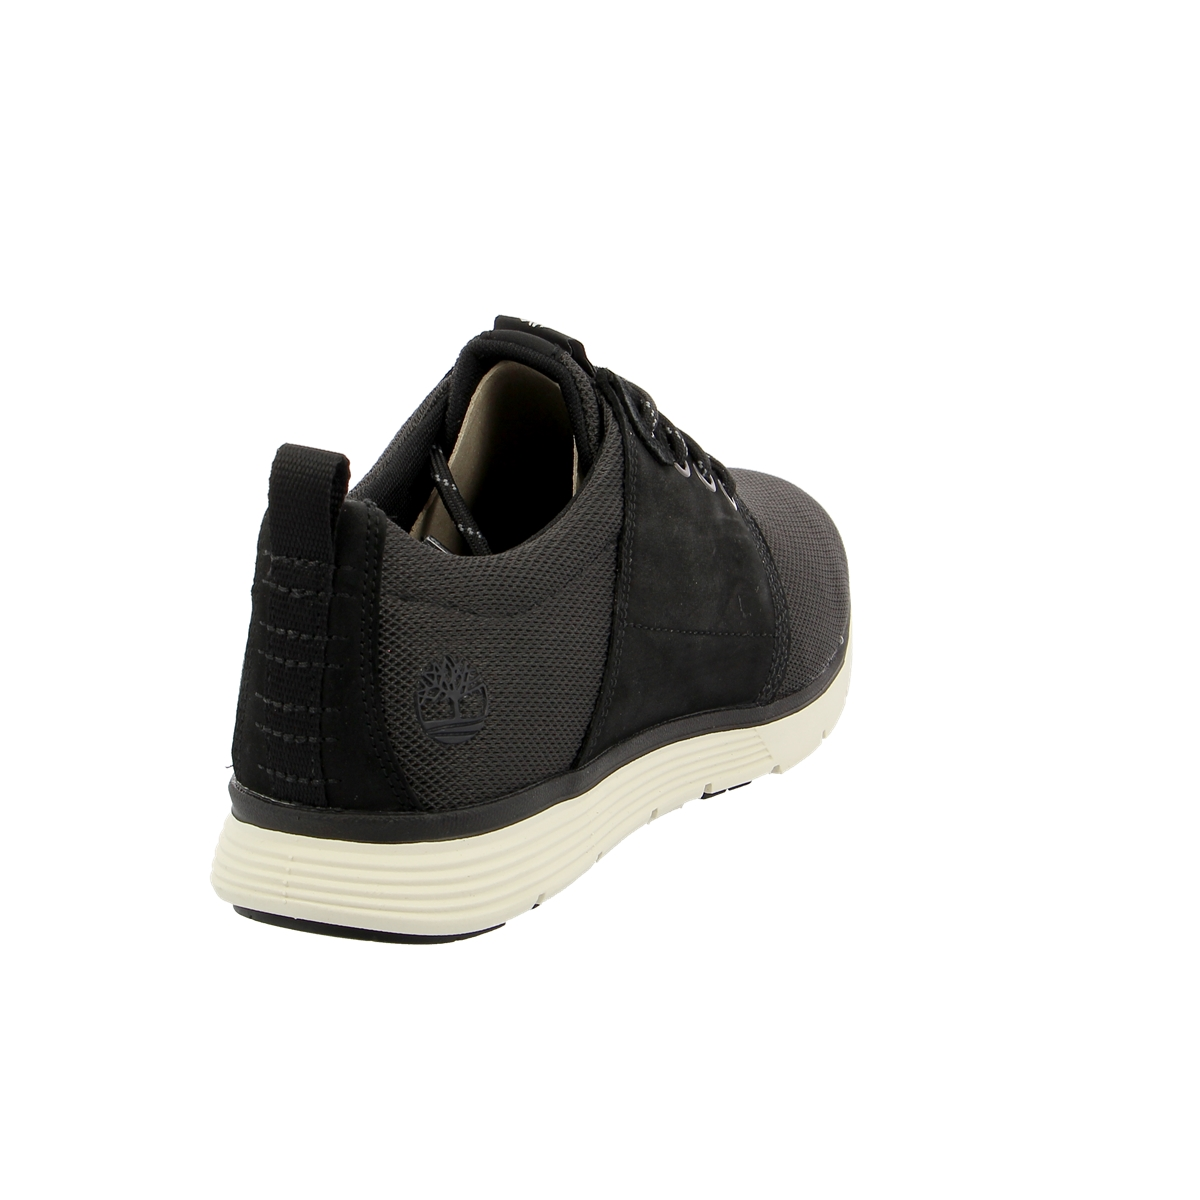 Timberland Basket noir